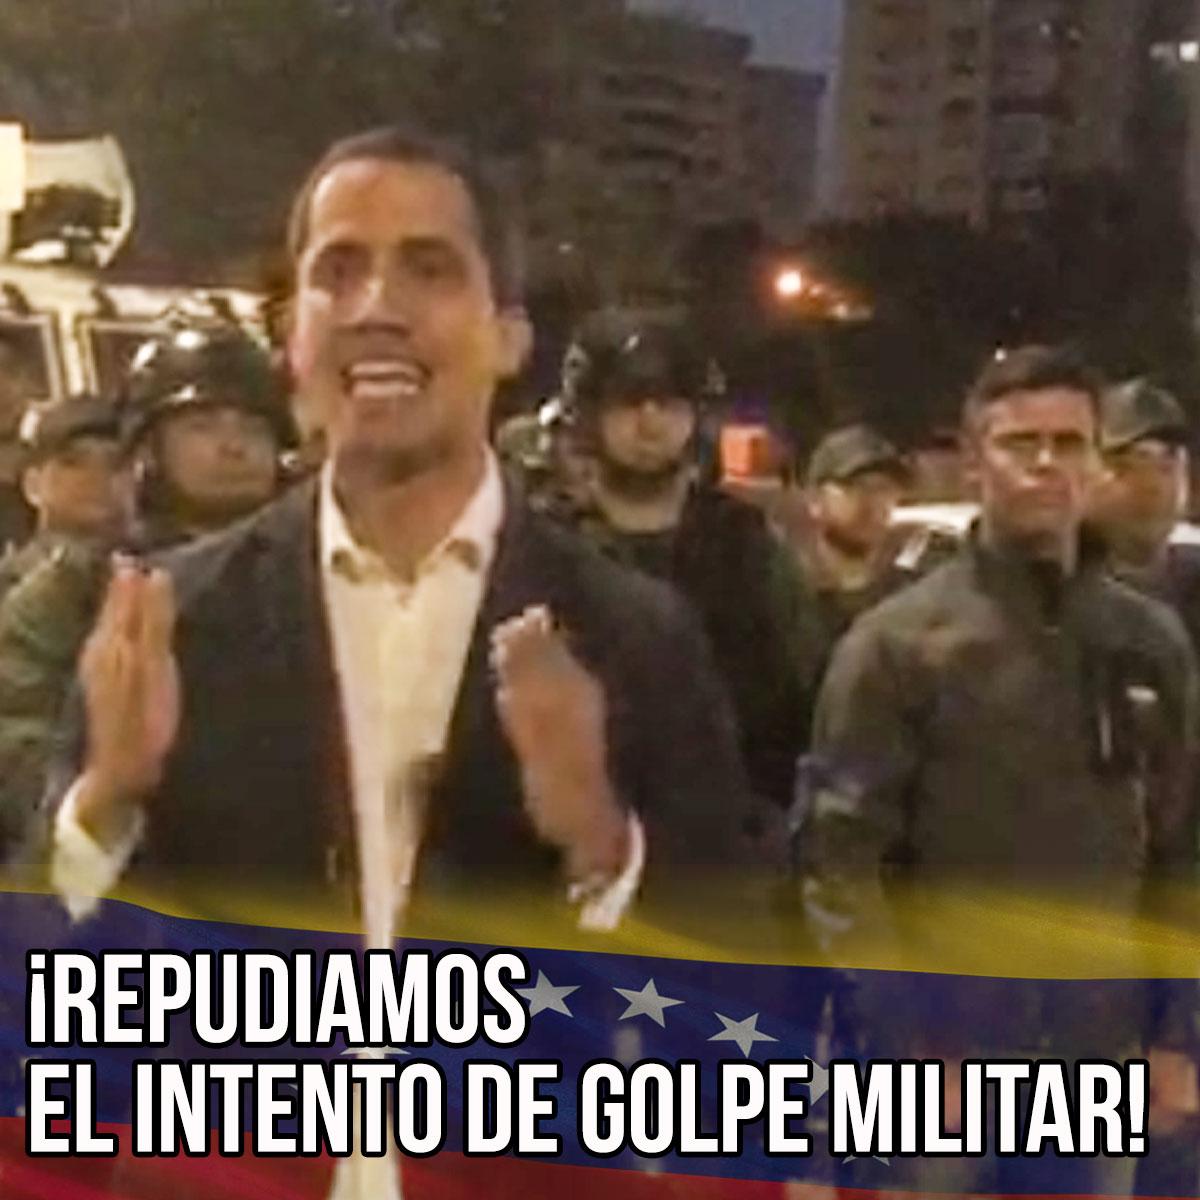 20190430-Repudiamos-el-golpe-militar-Venezuela